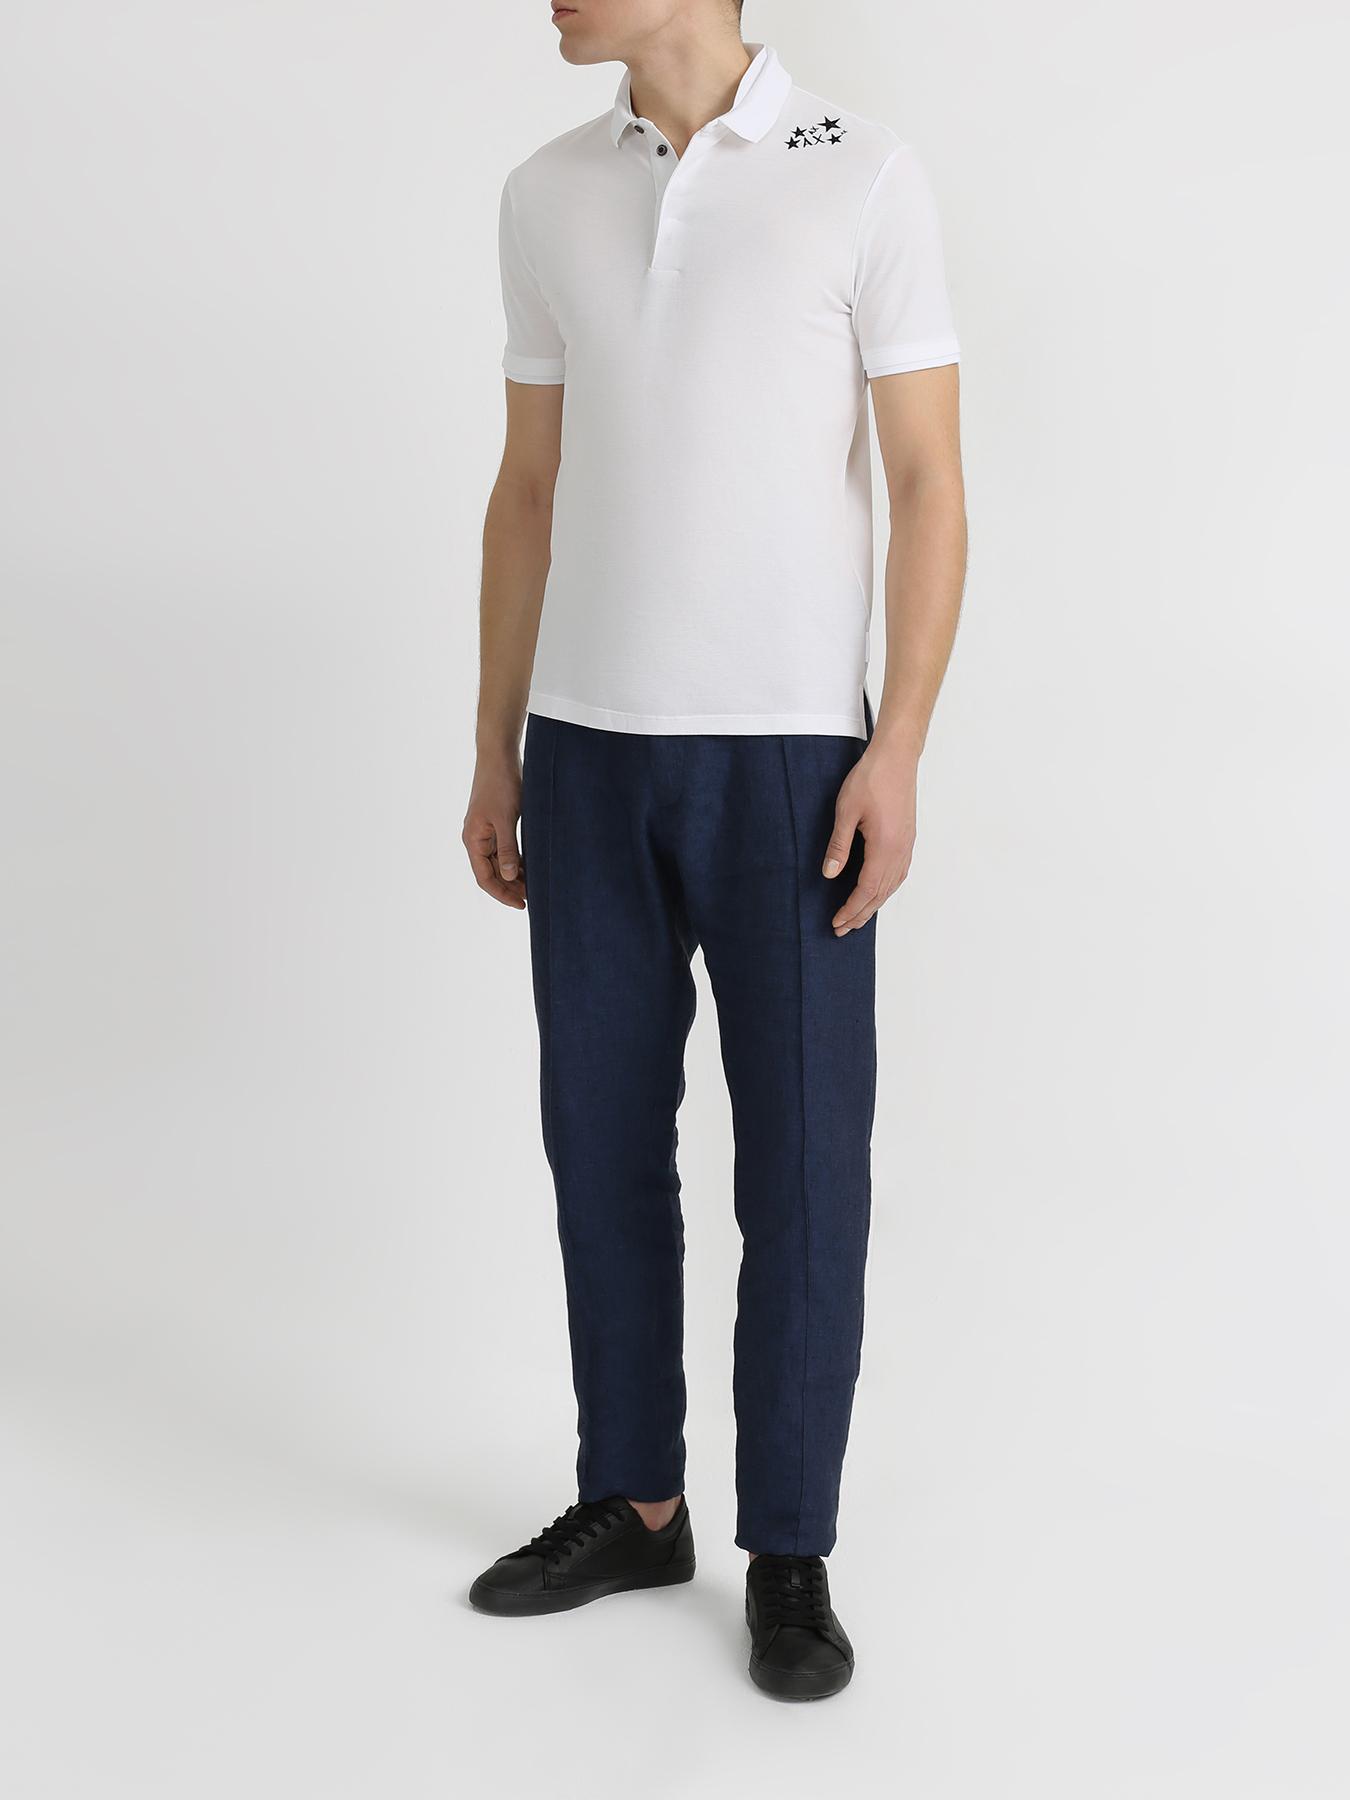 Брюки Emporio Armani Льняные брюки на резинке